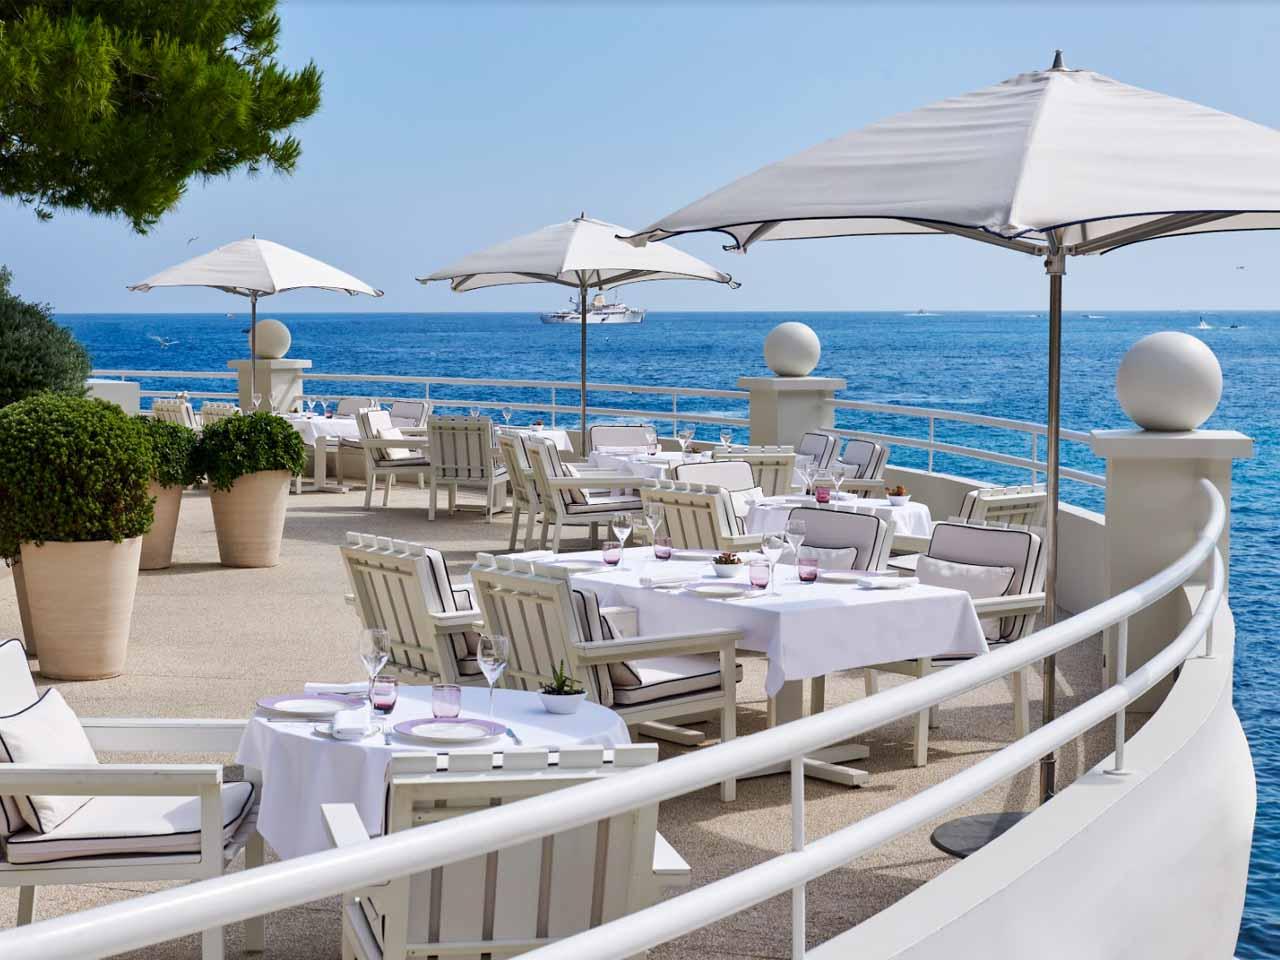 Sternerestaurants in Monaco - Restaurant Elsa